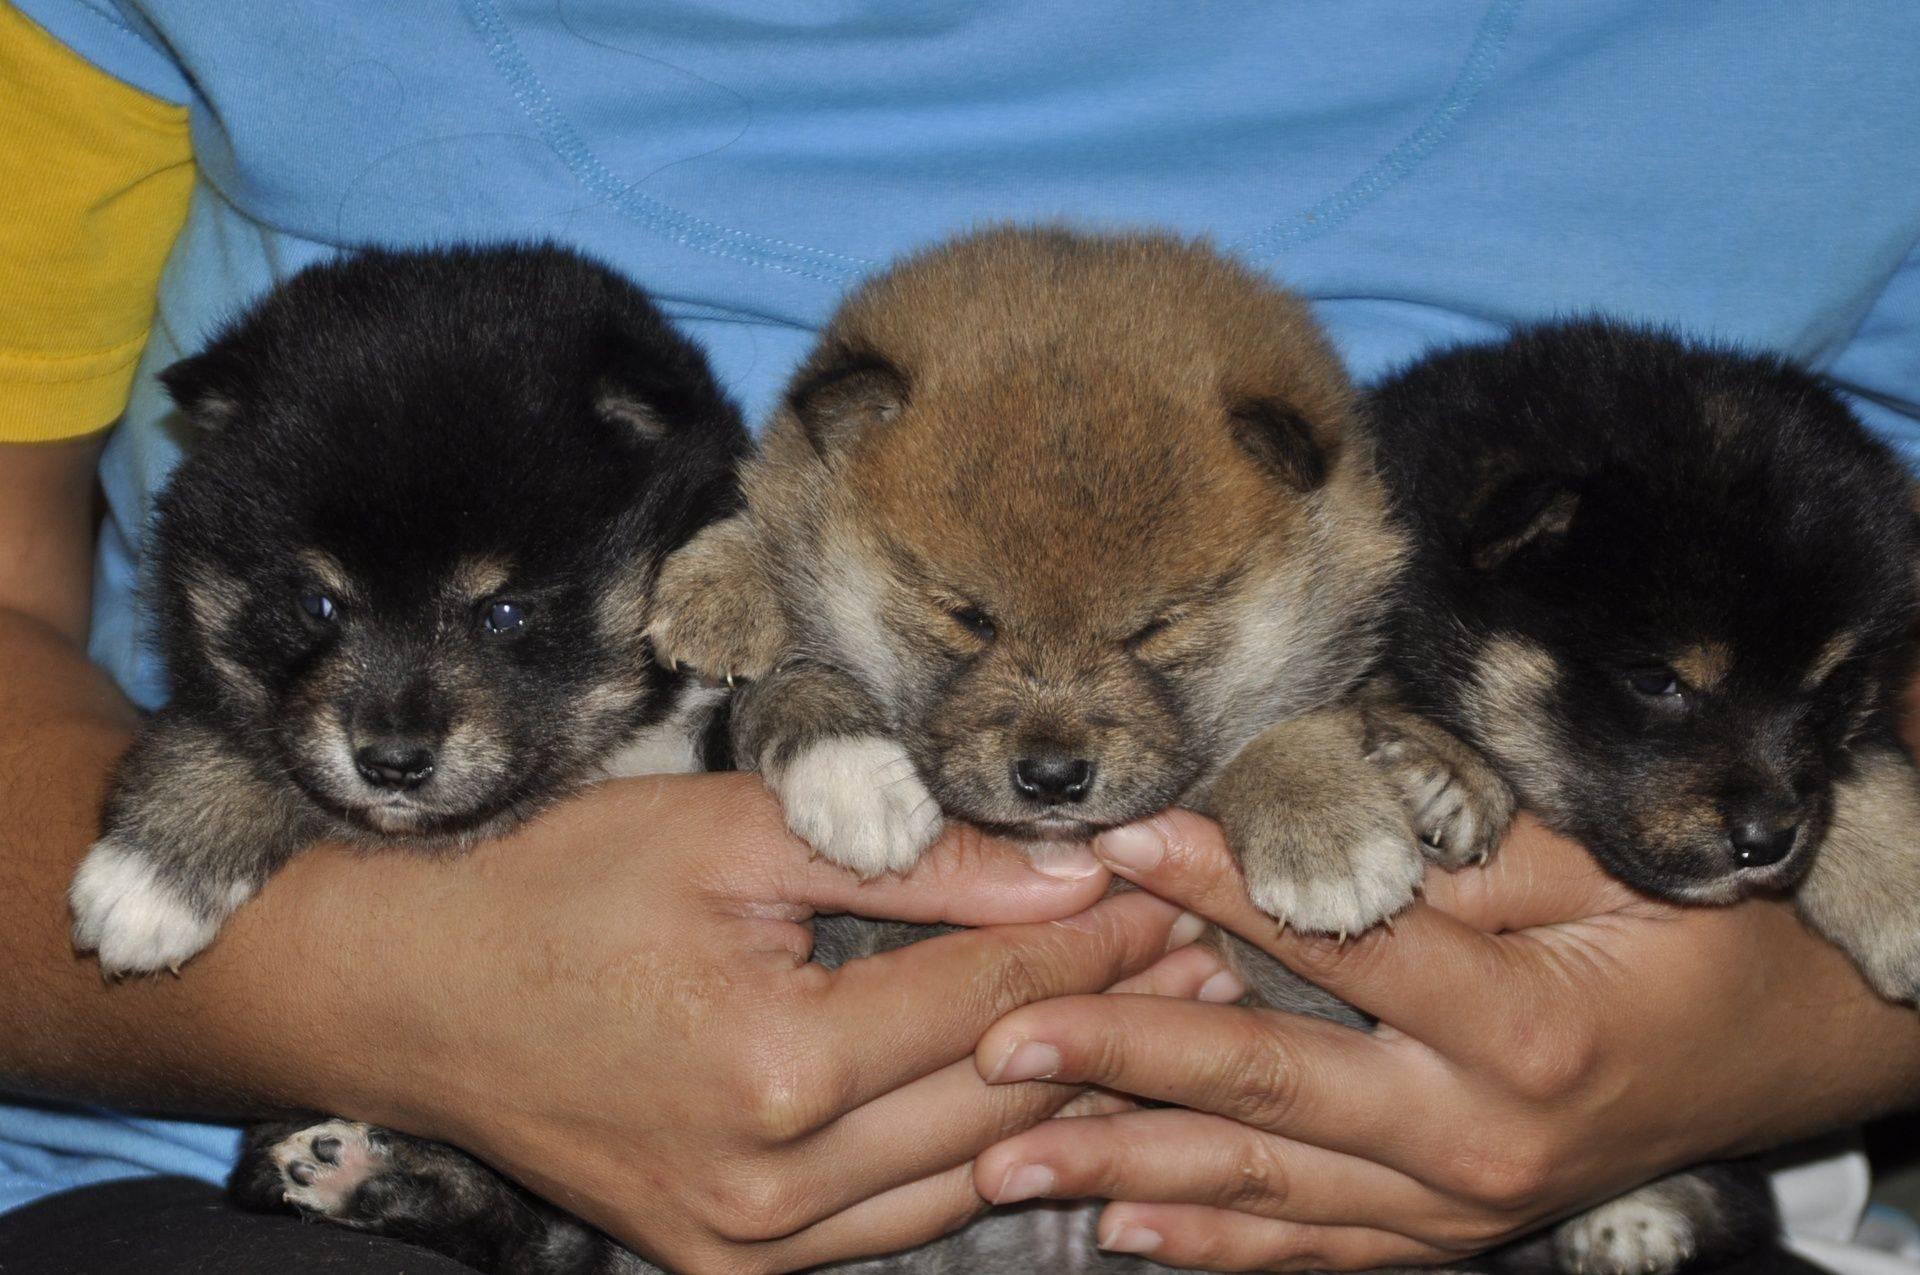 Trained Shiba inu puppies